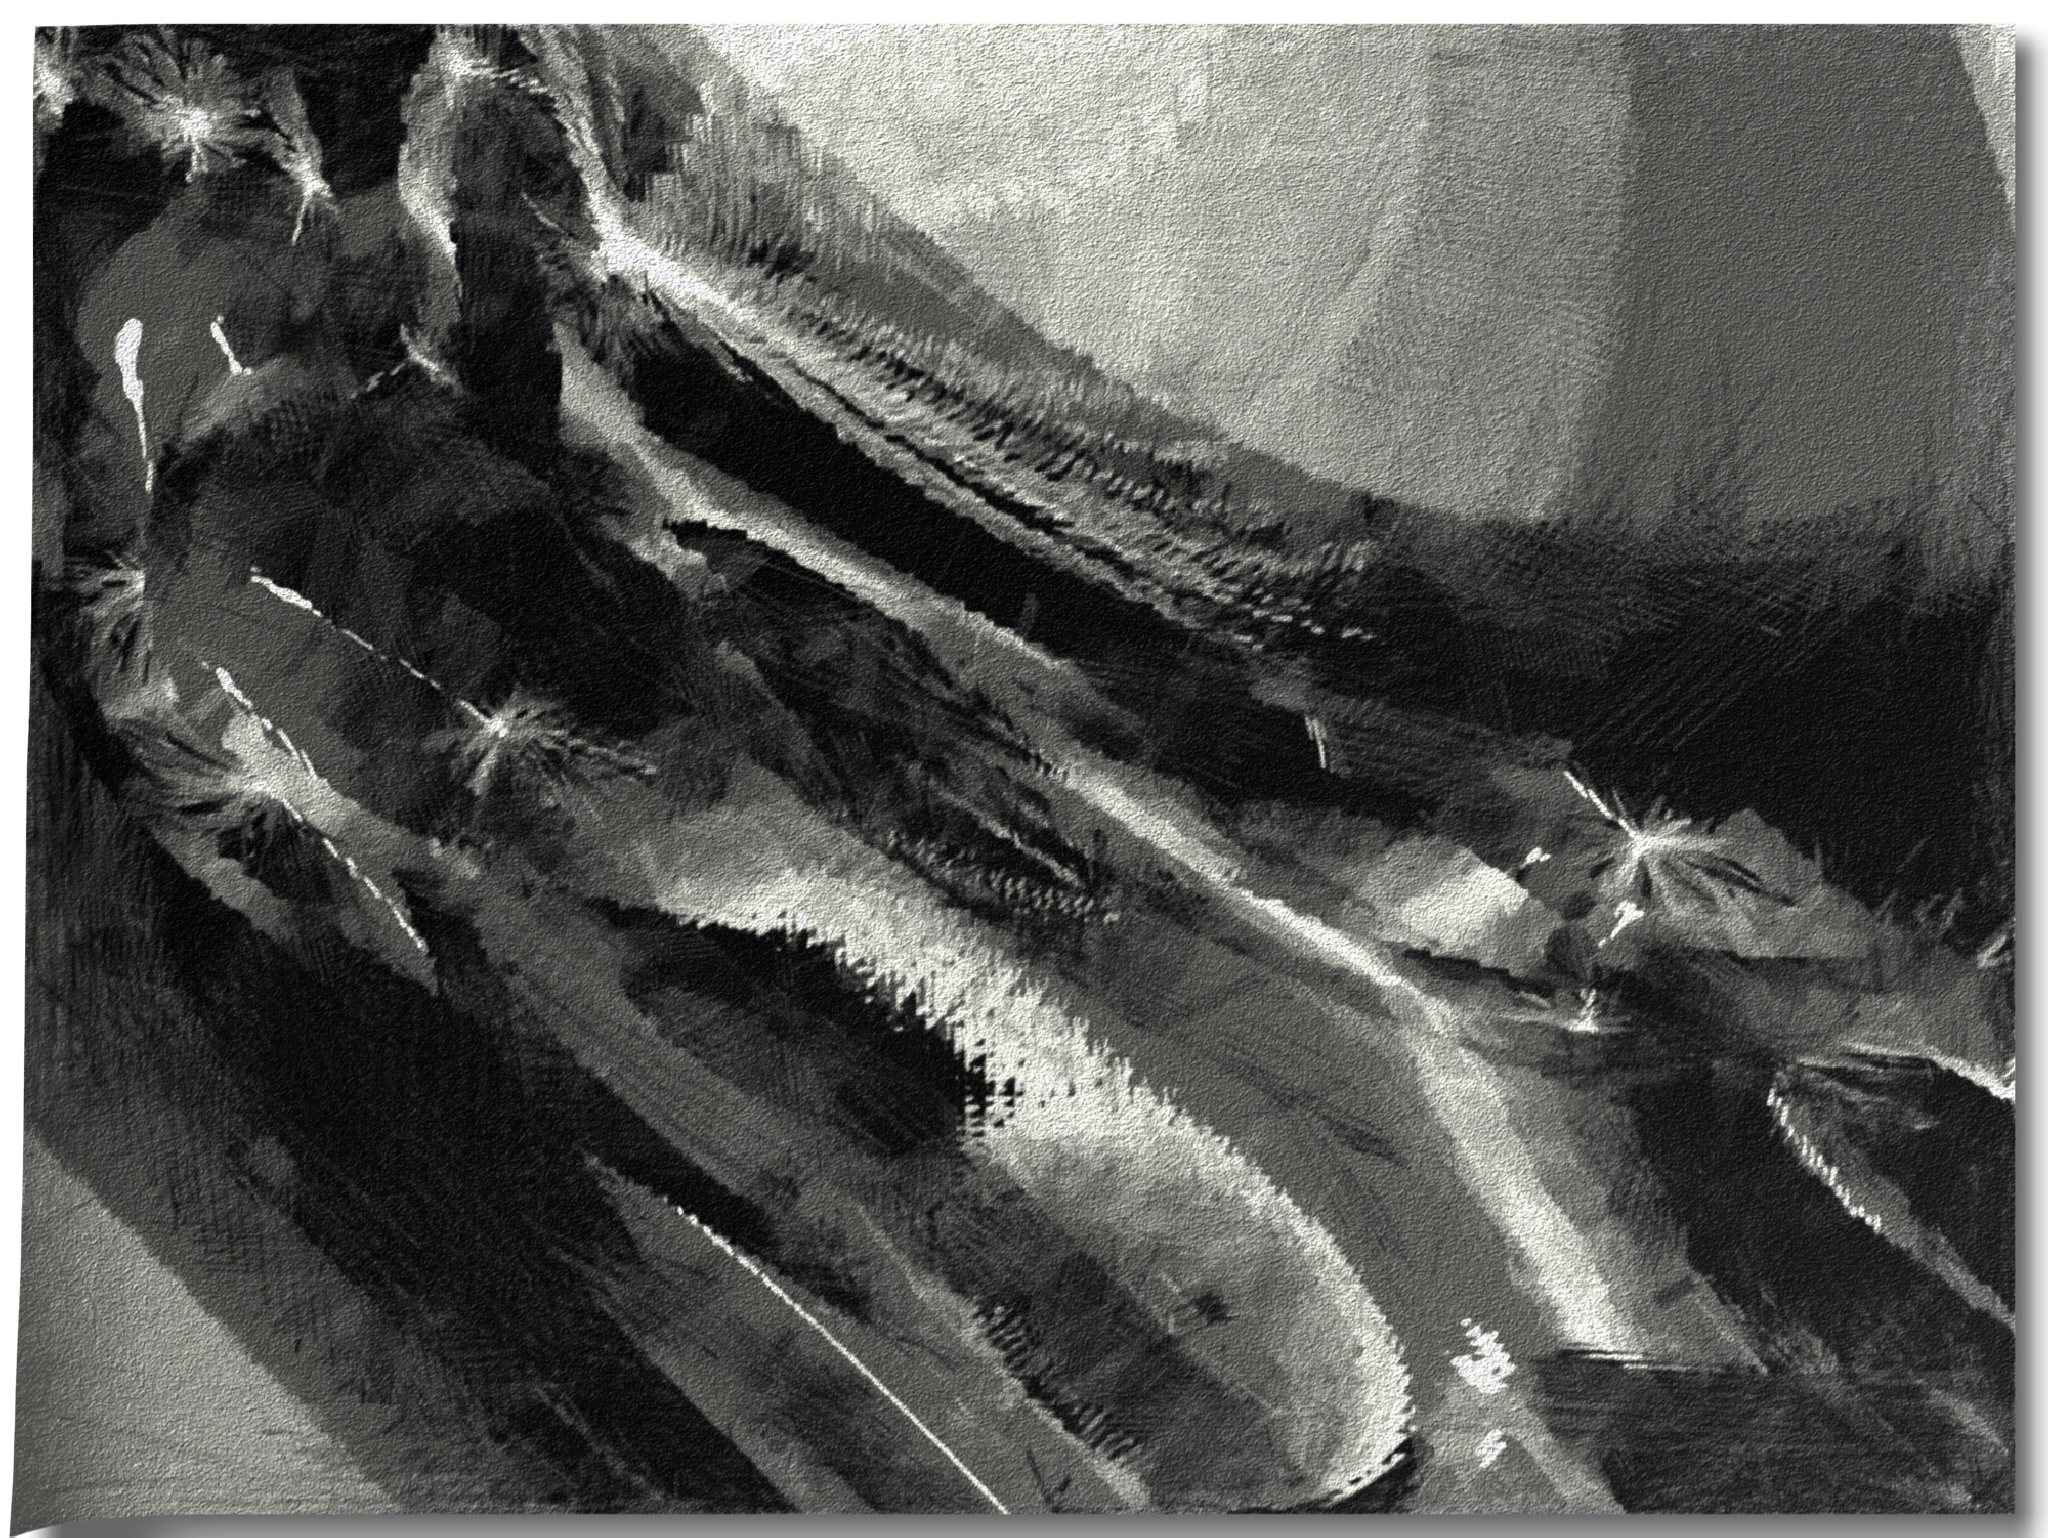 Darkwing  by Littleffect